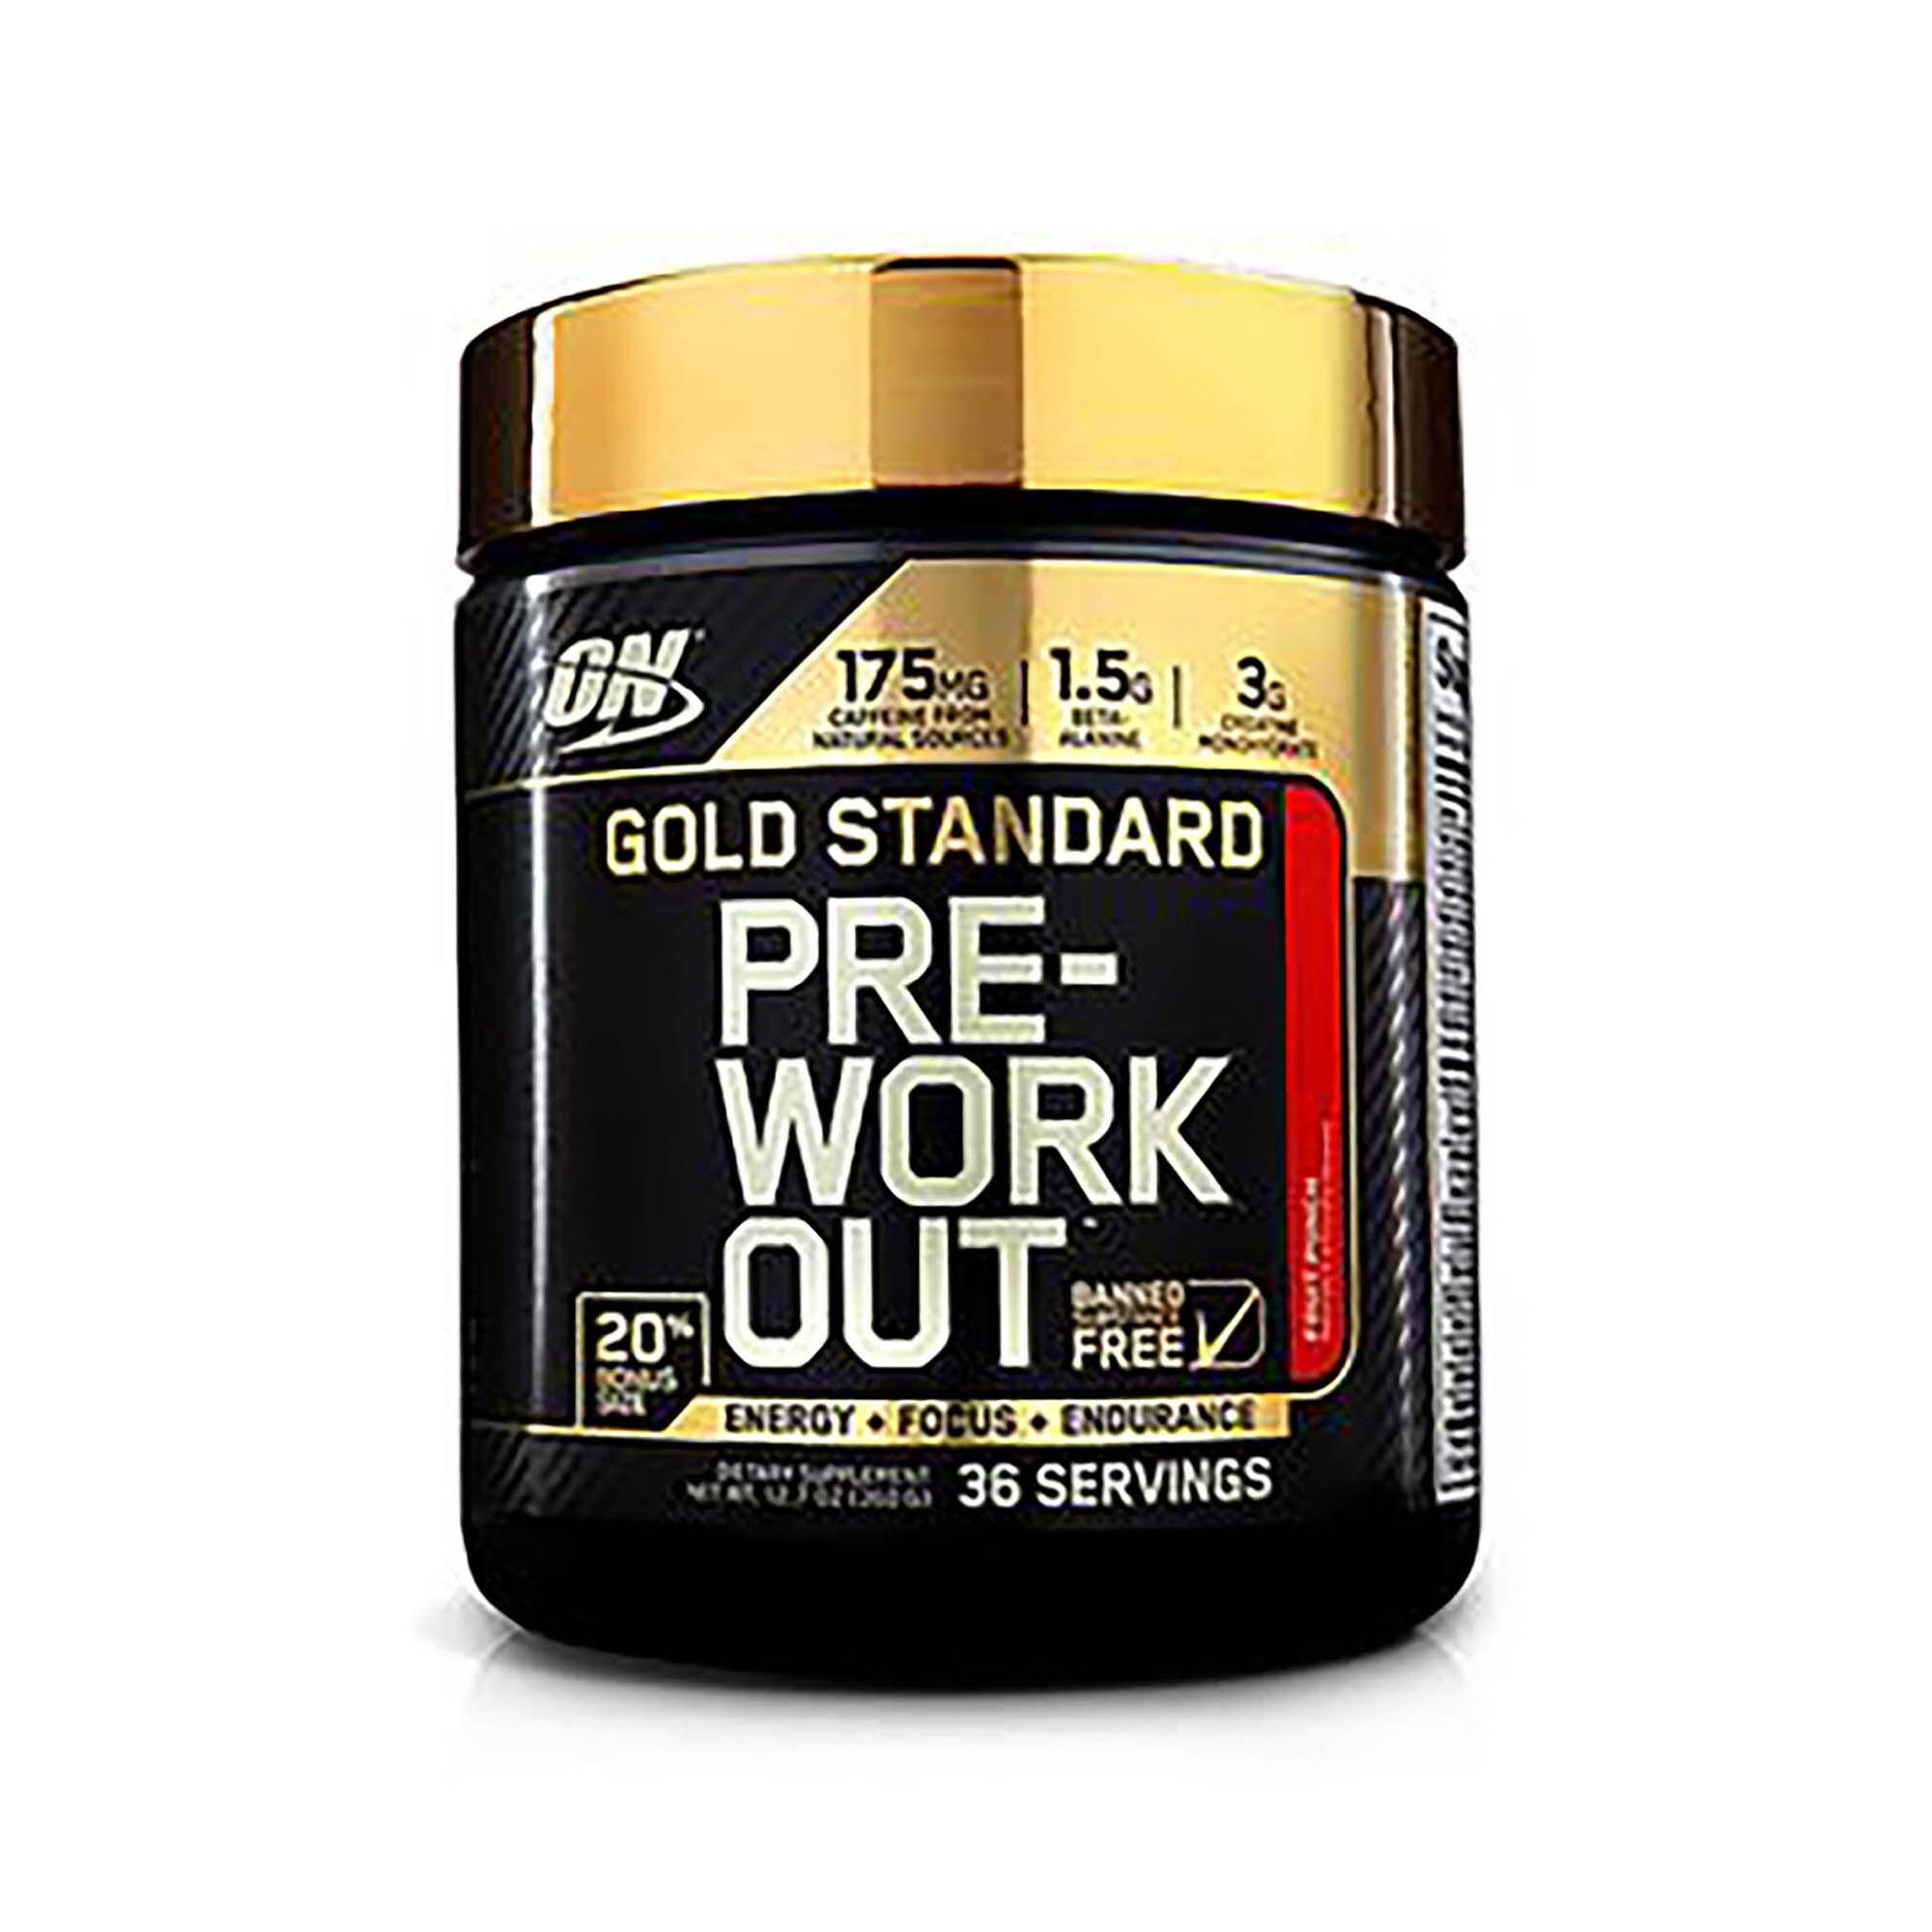 Gold Standard Pre-workoutg�� - Fruit Punch - Exclusive 20% More Free Bonus Size - 36 Servings - Optimum Nutrition - Energy Formulas